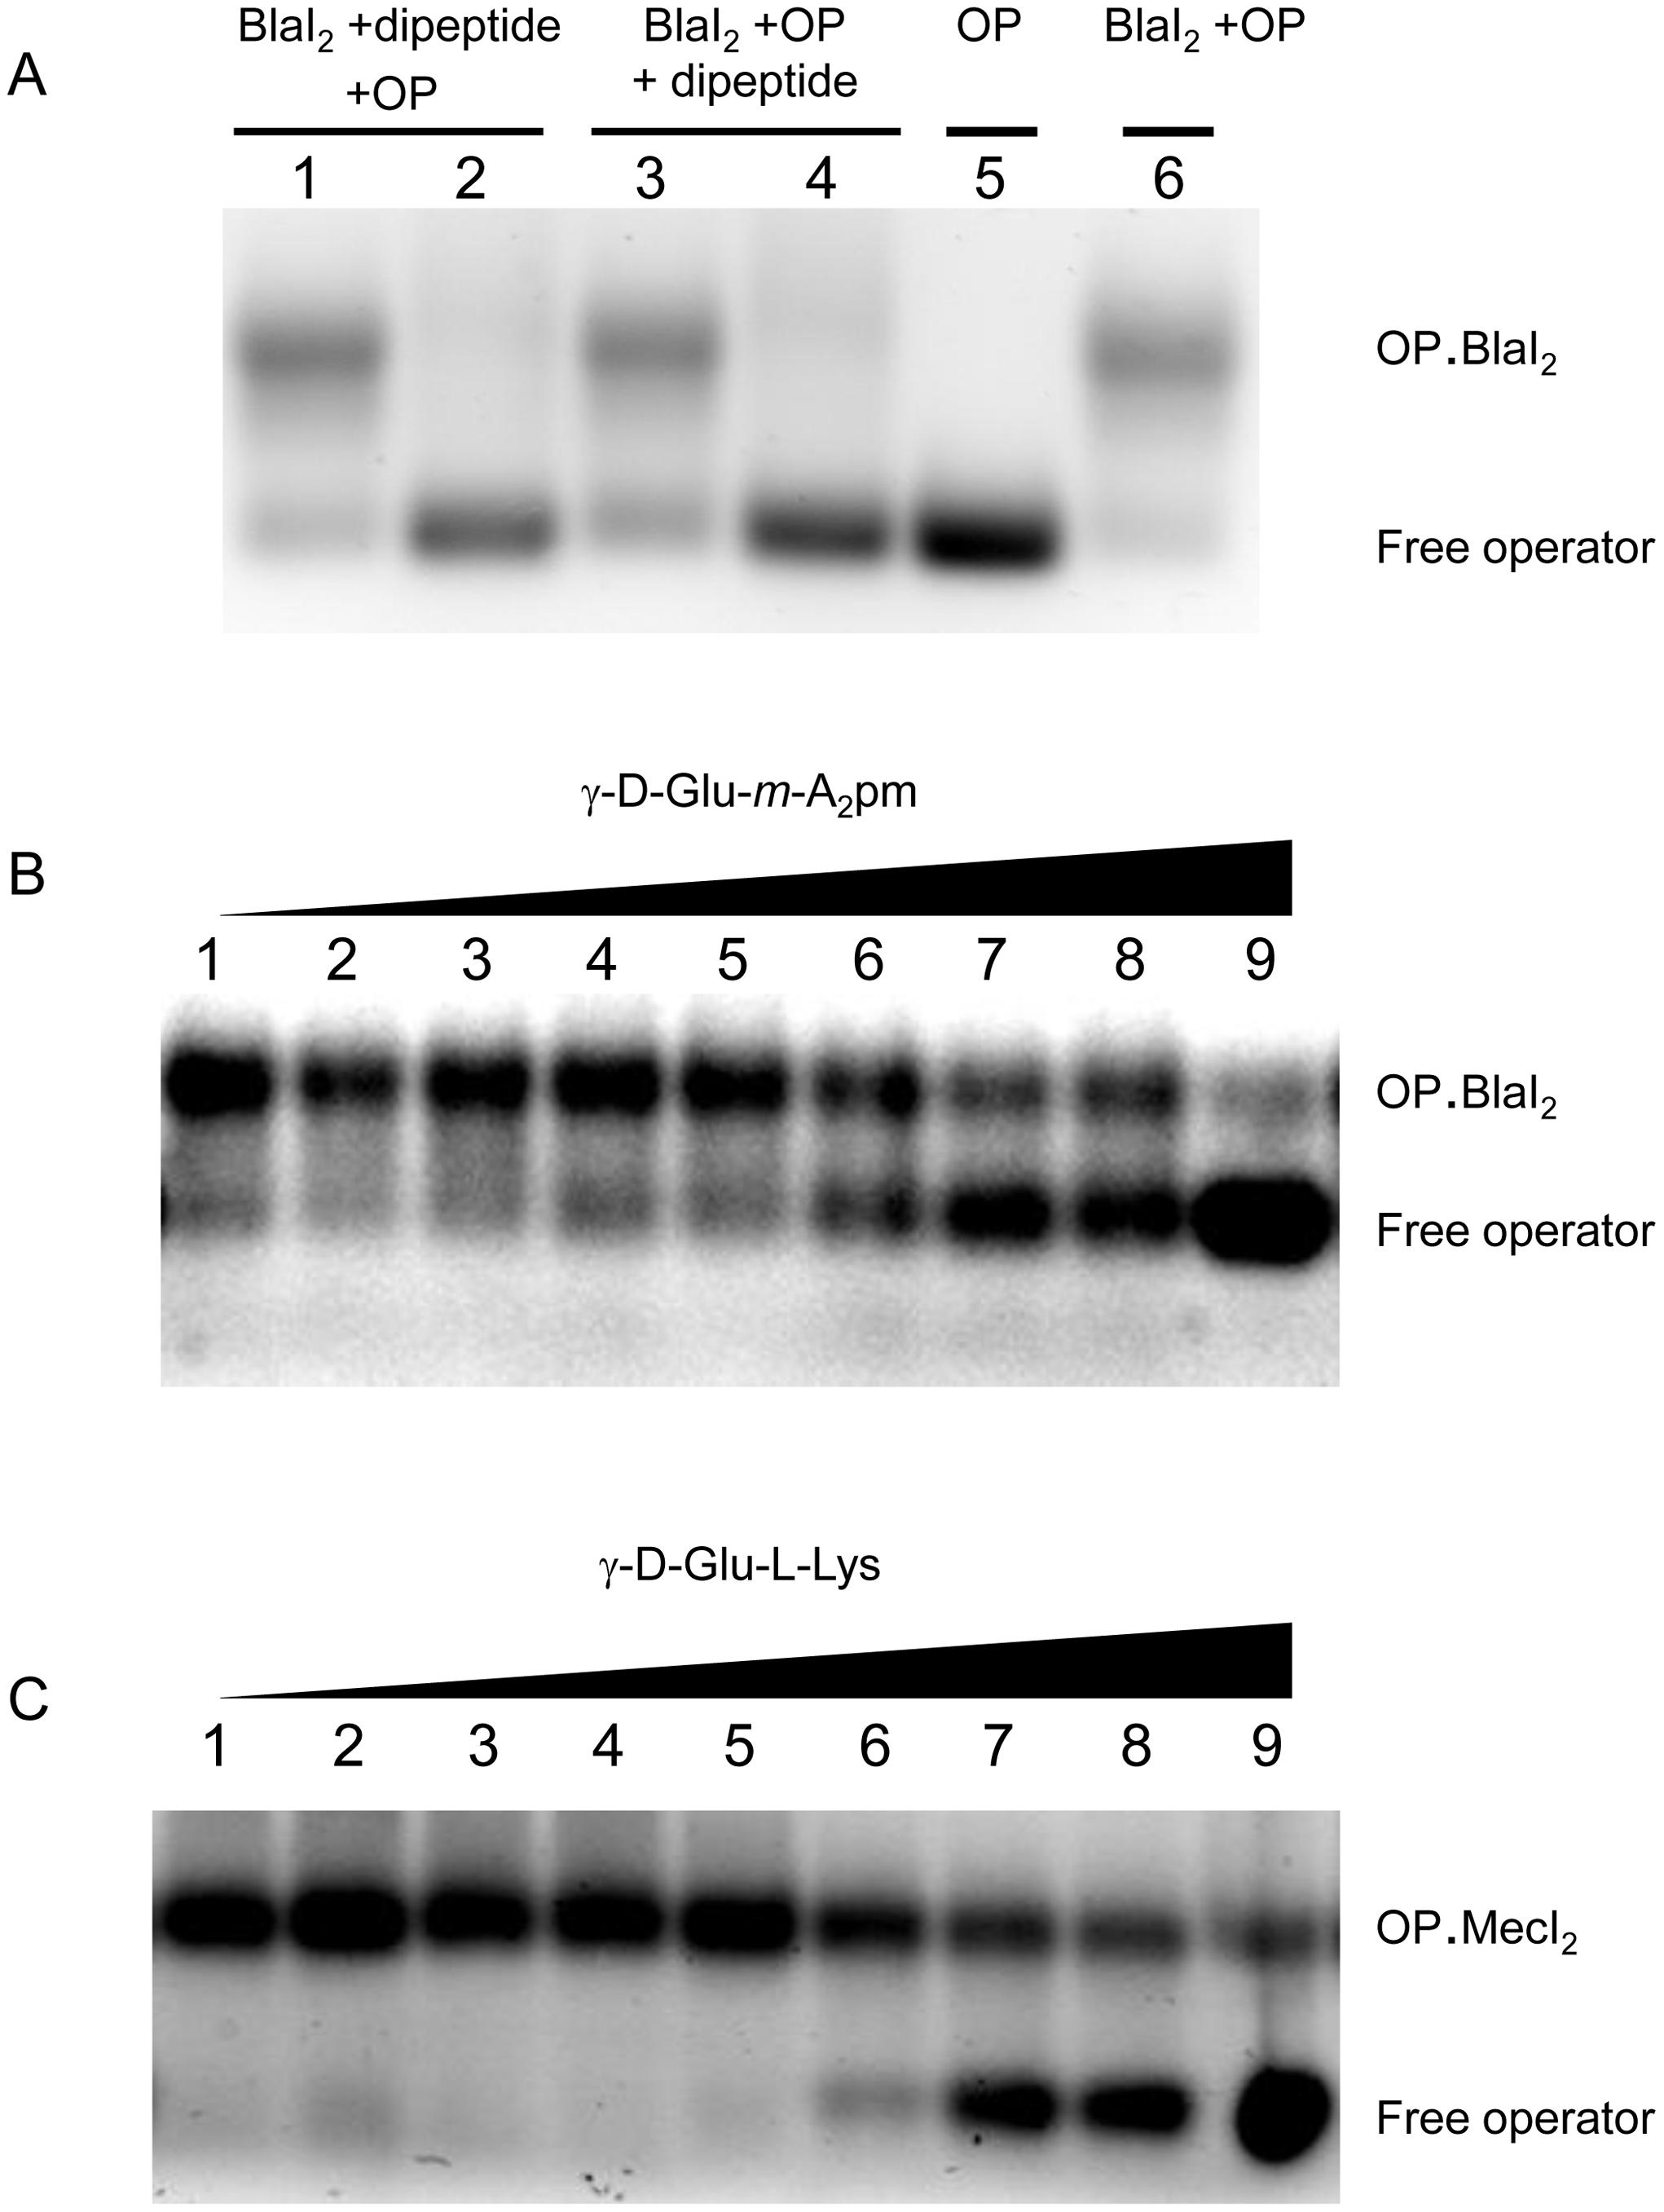 EMSA of BlaI/MecI.OP complex in presence of dipeptide.